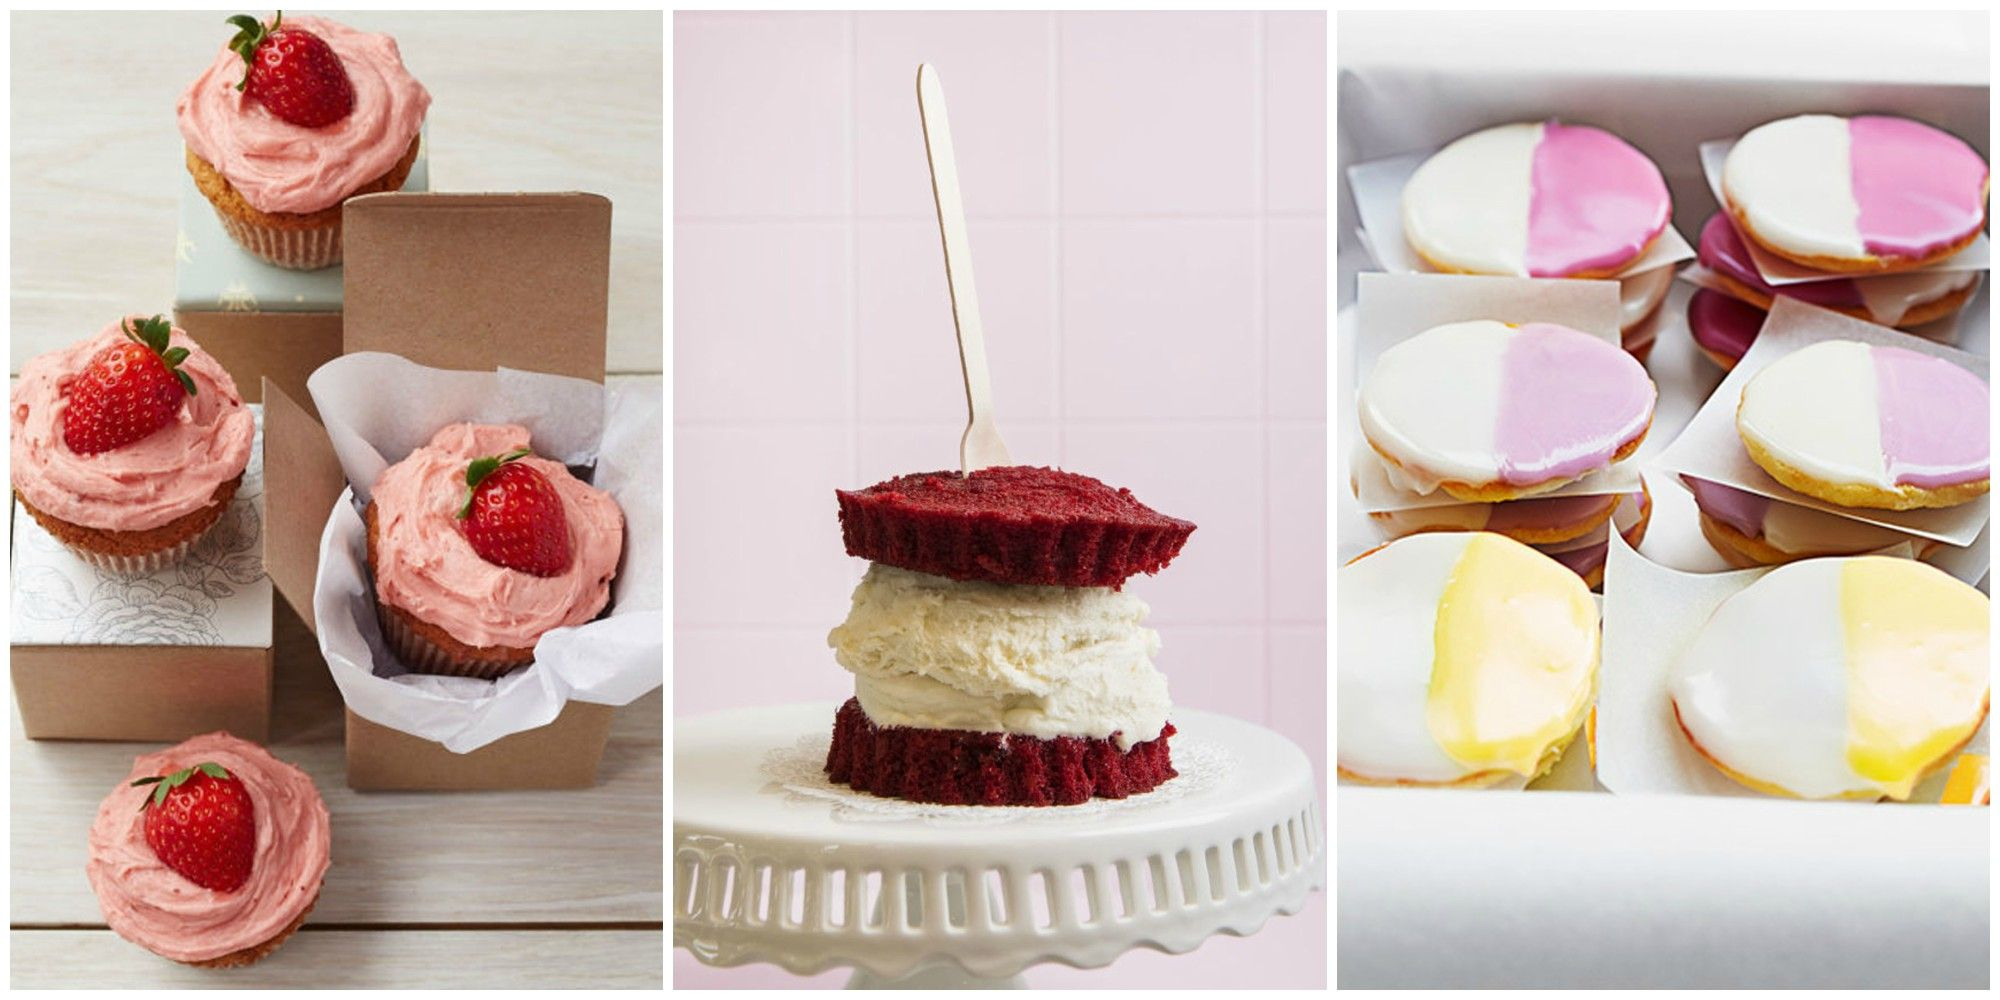 15 Easy Dessert Recipes For Kids Best Kid Friendly Dessert Ideas